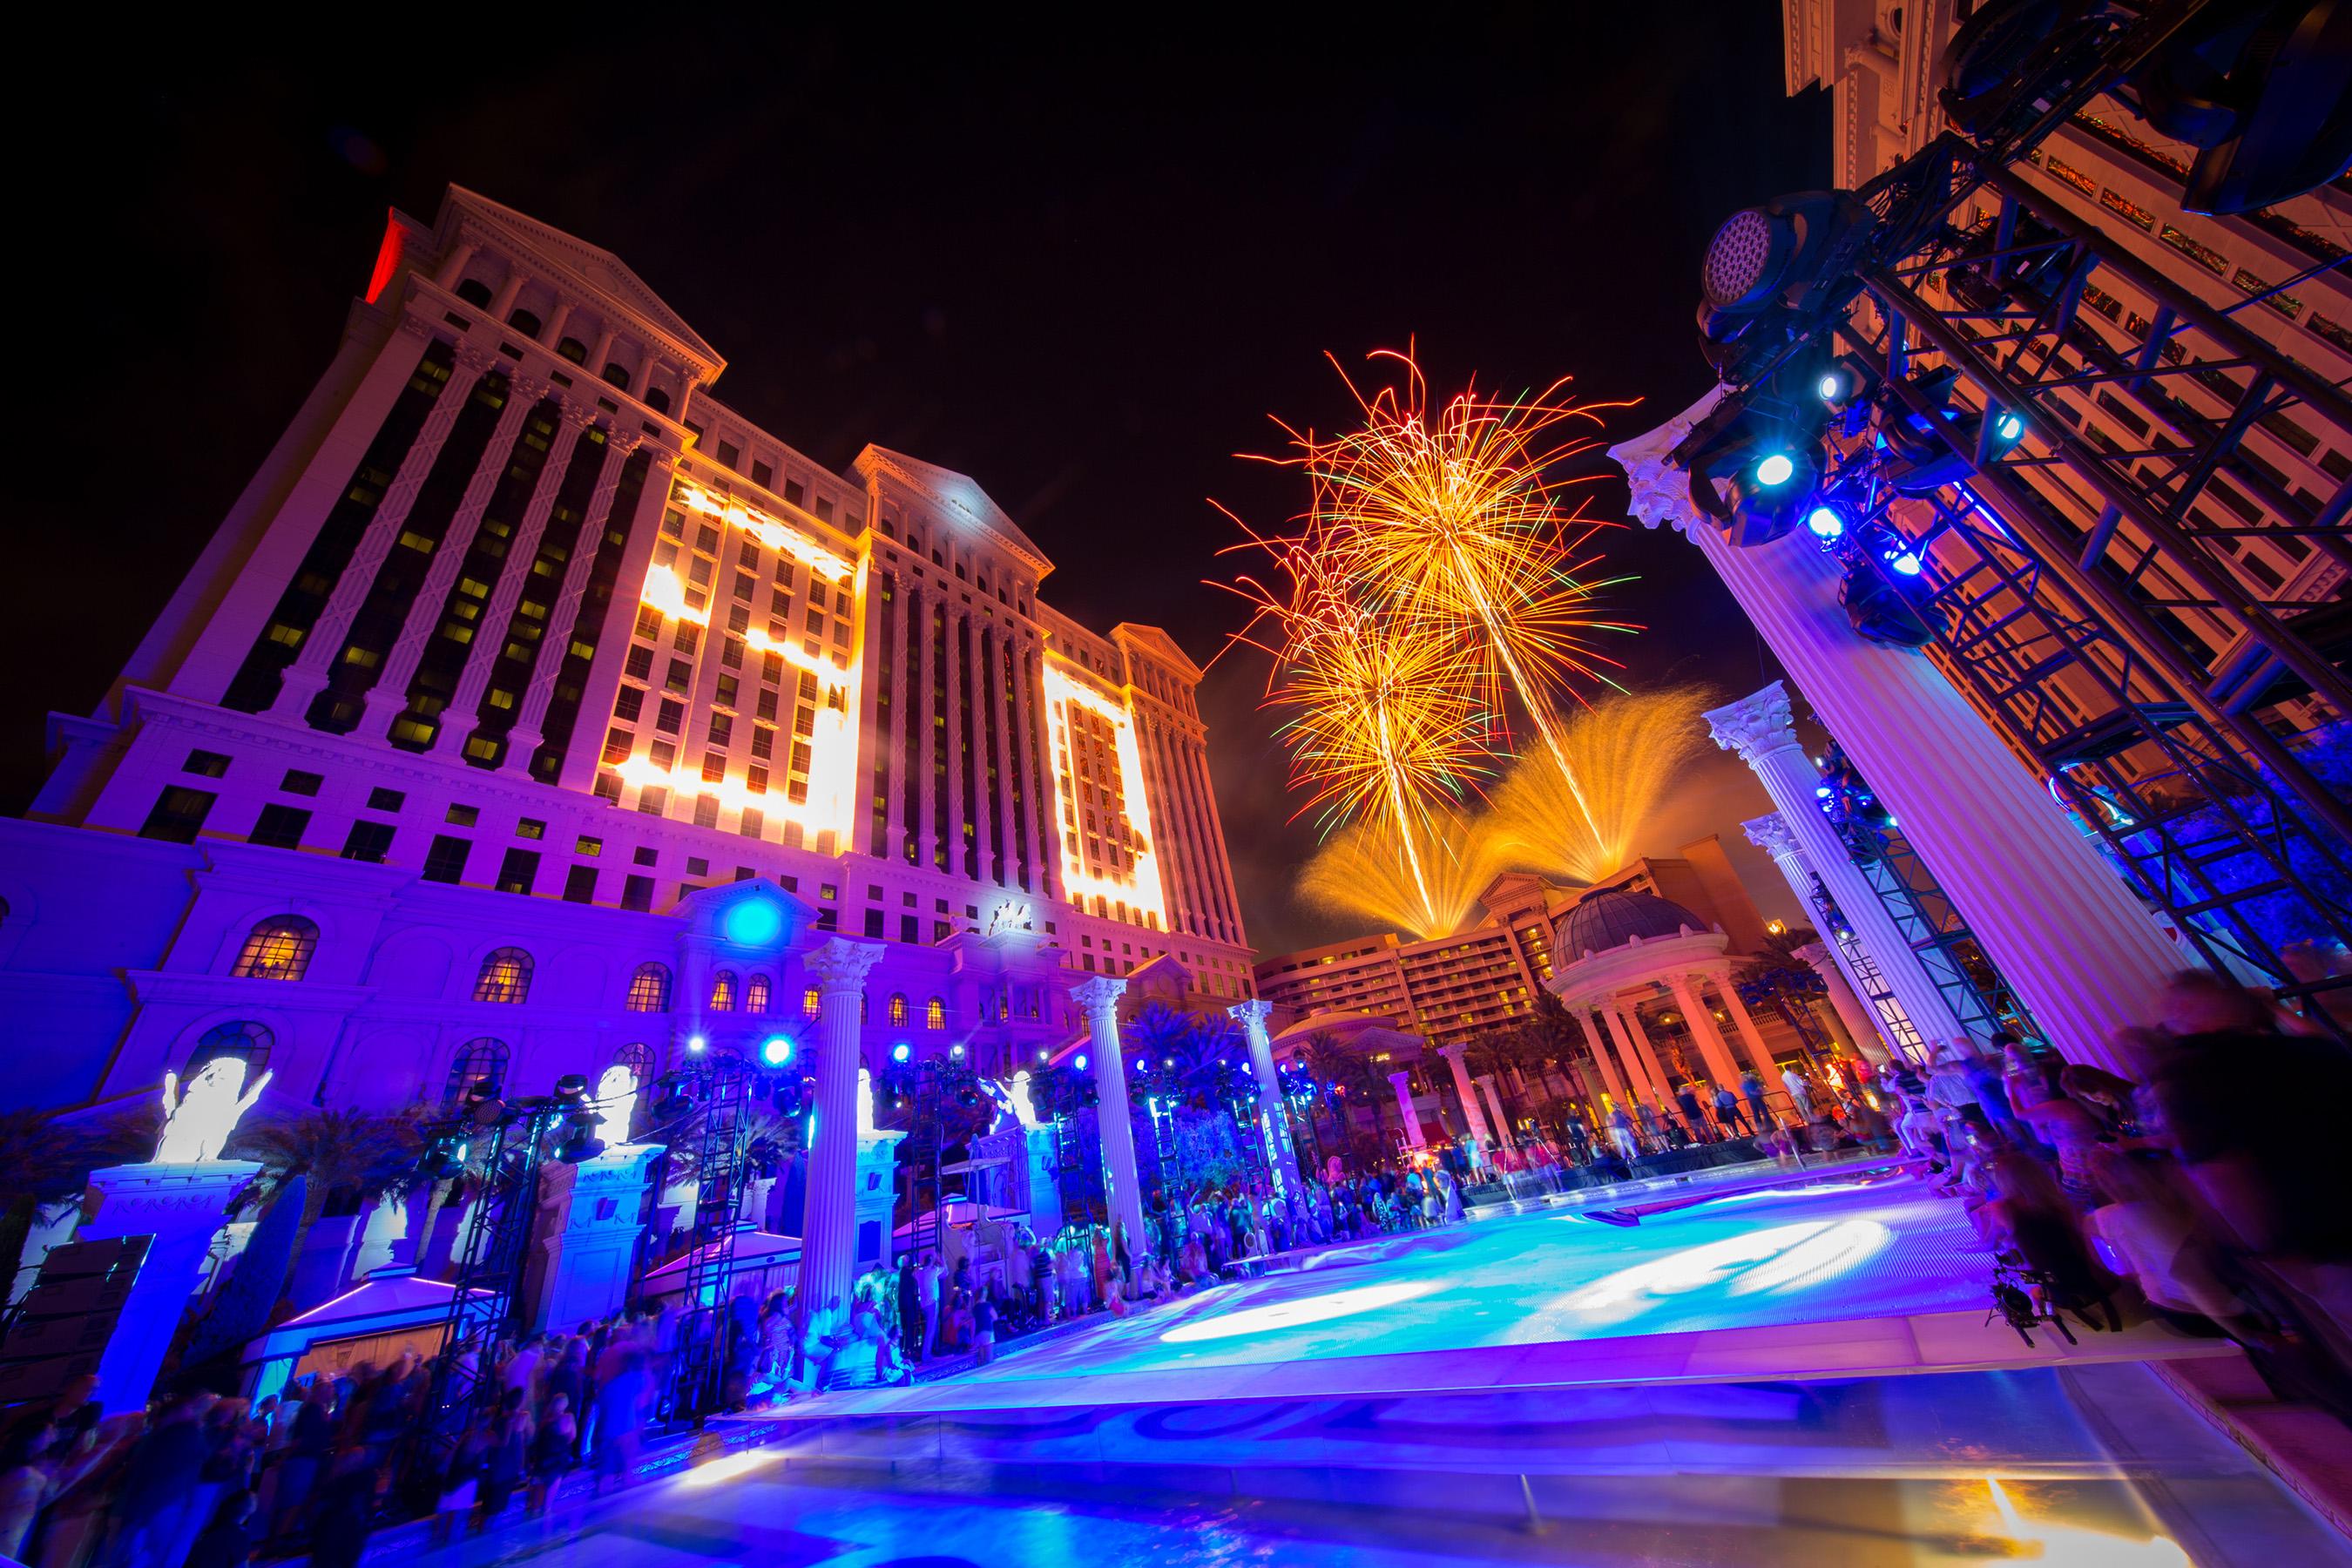 Fireworks display at Caesars Palace in Las Vegas